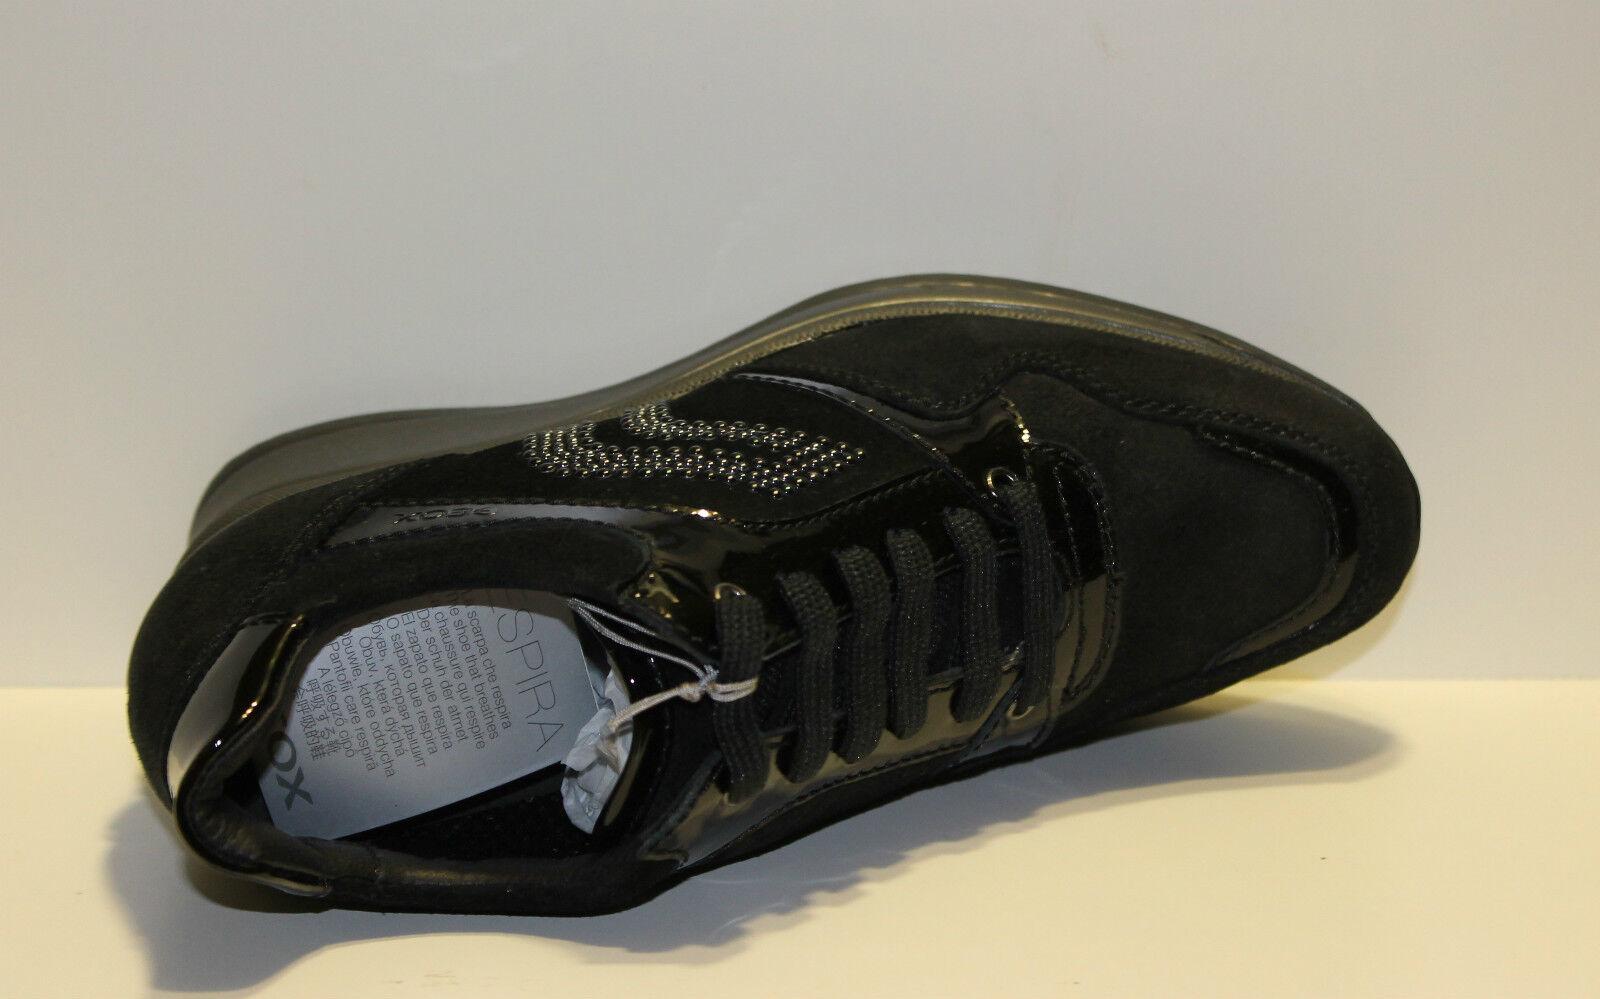 Regina Sneaker Scarpa 8qxxrxw 02266 Geox D5475a Donna 80vPmNnywO